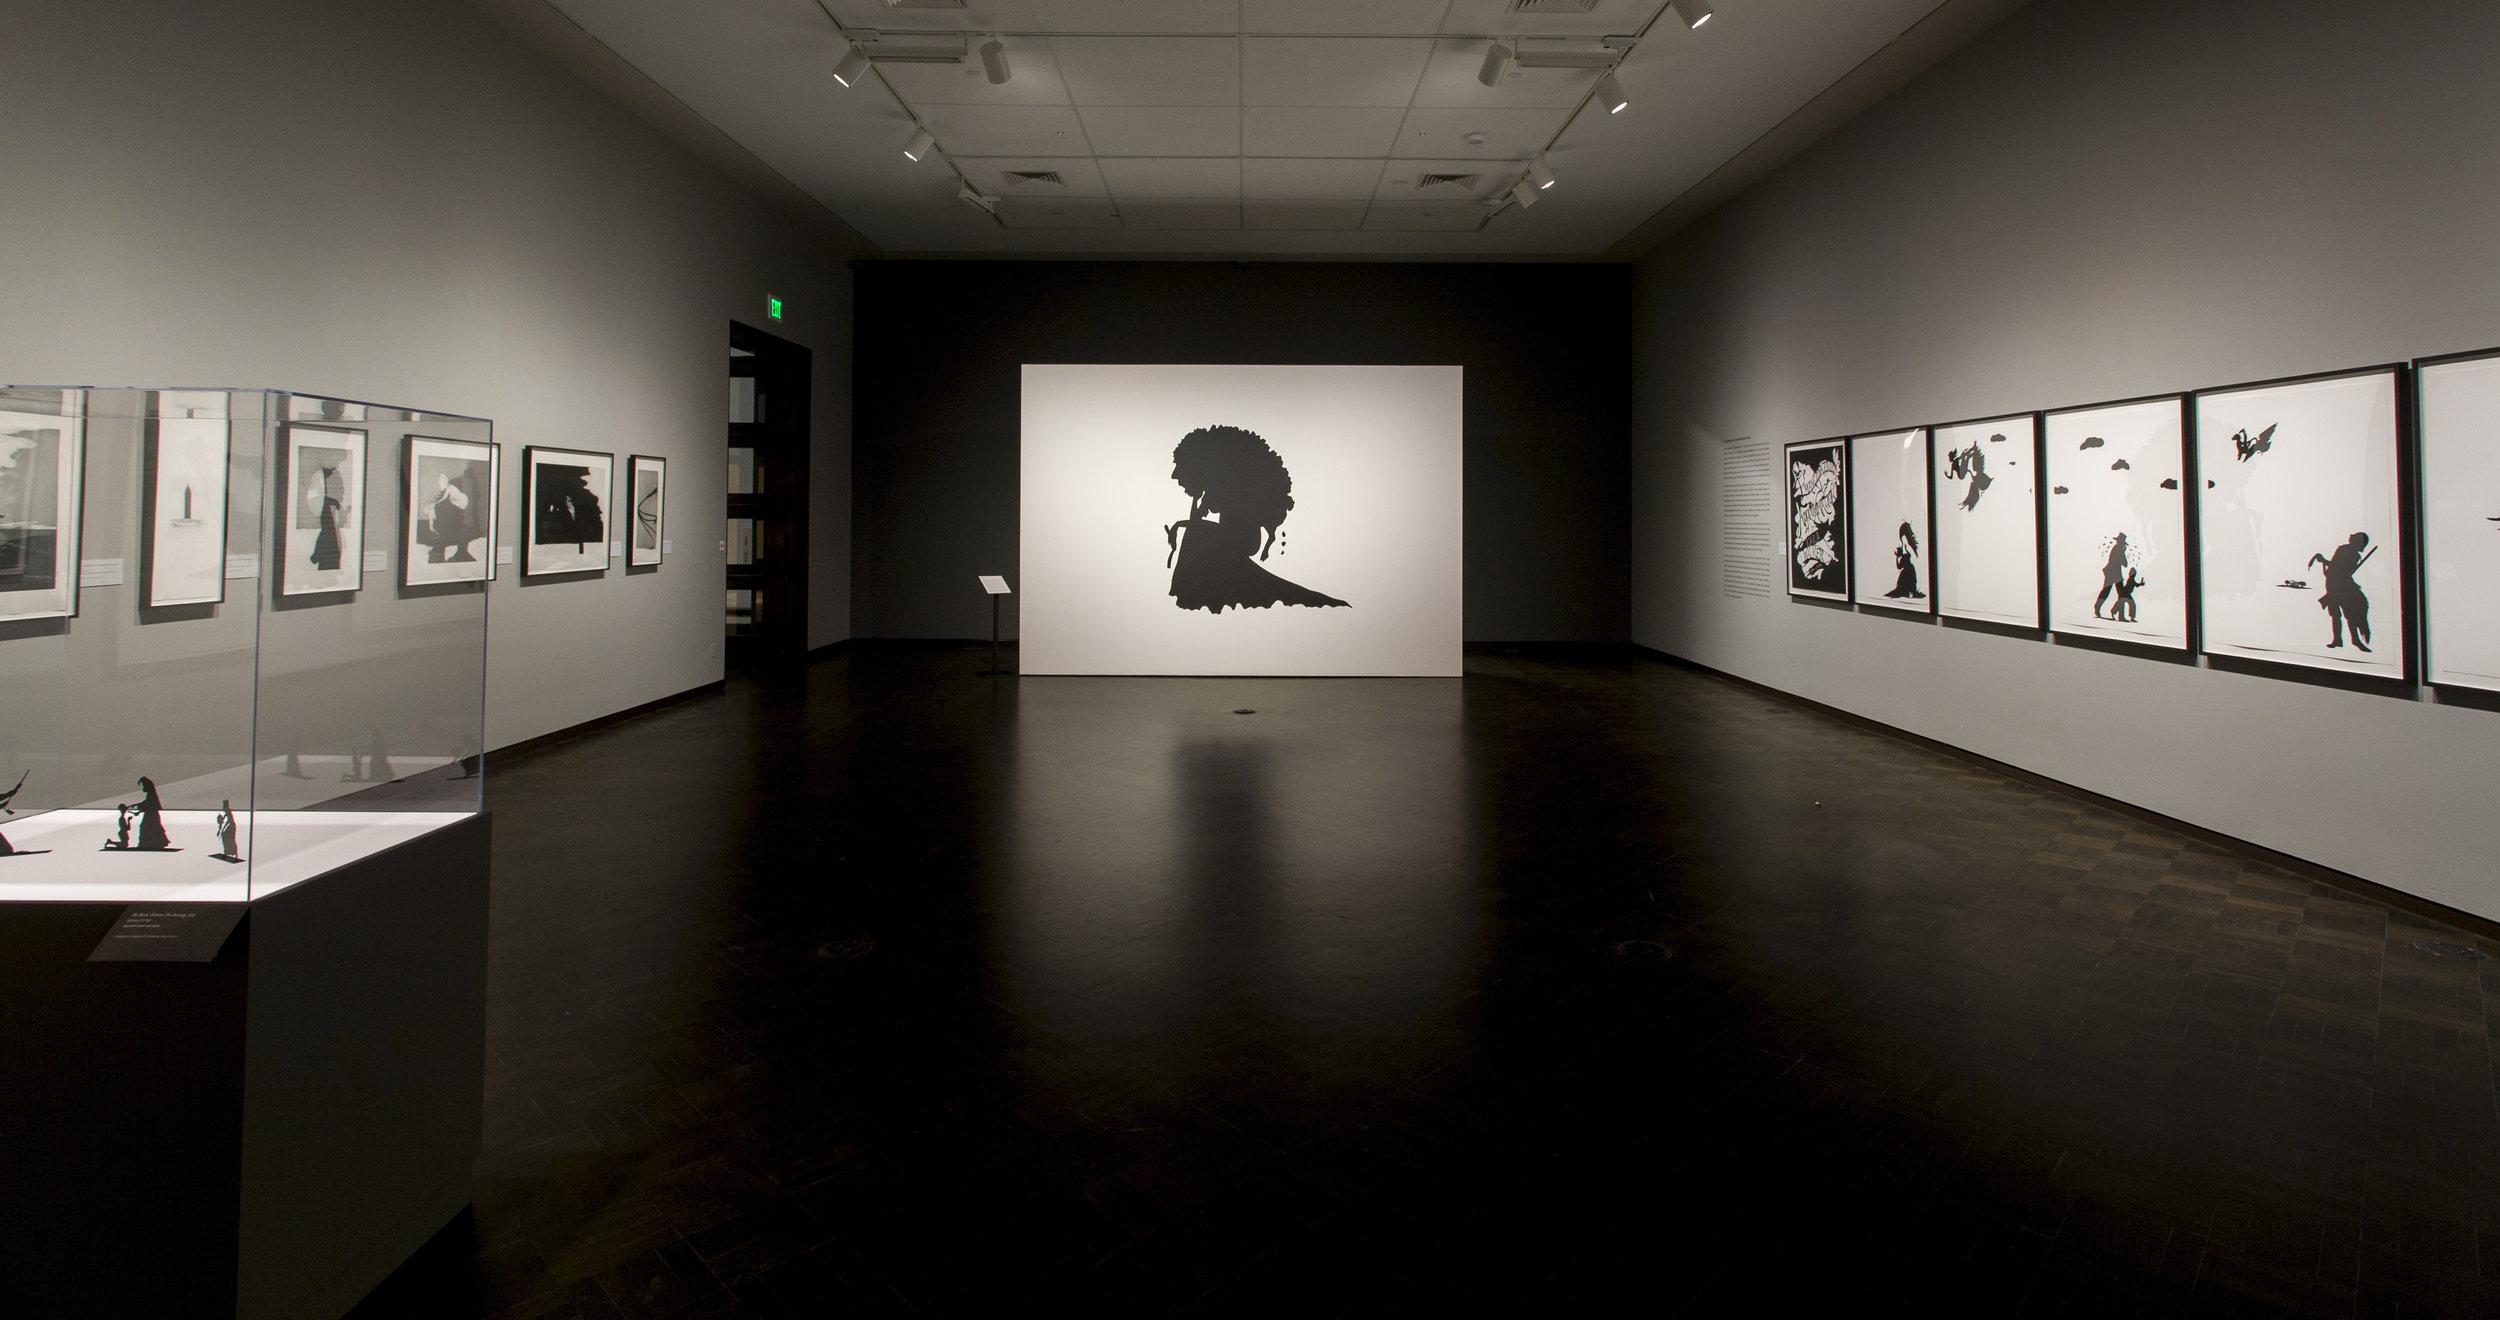 emancipating the past: - Kara Walker's Tales of Slavery and Power